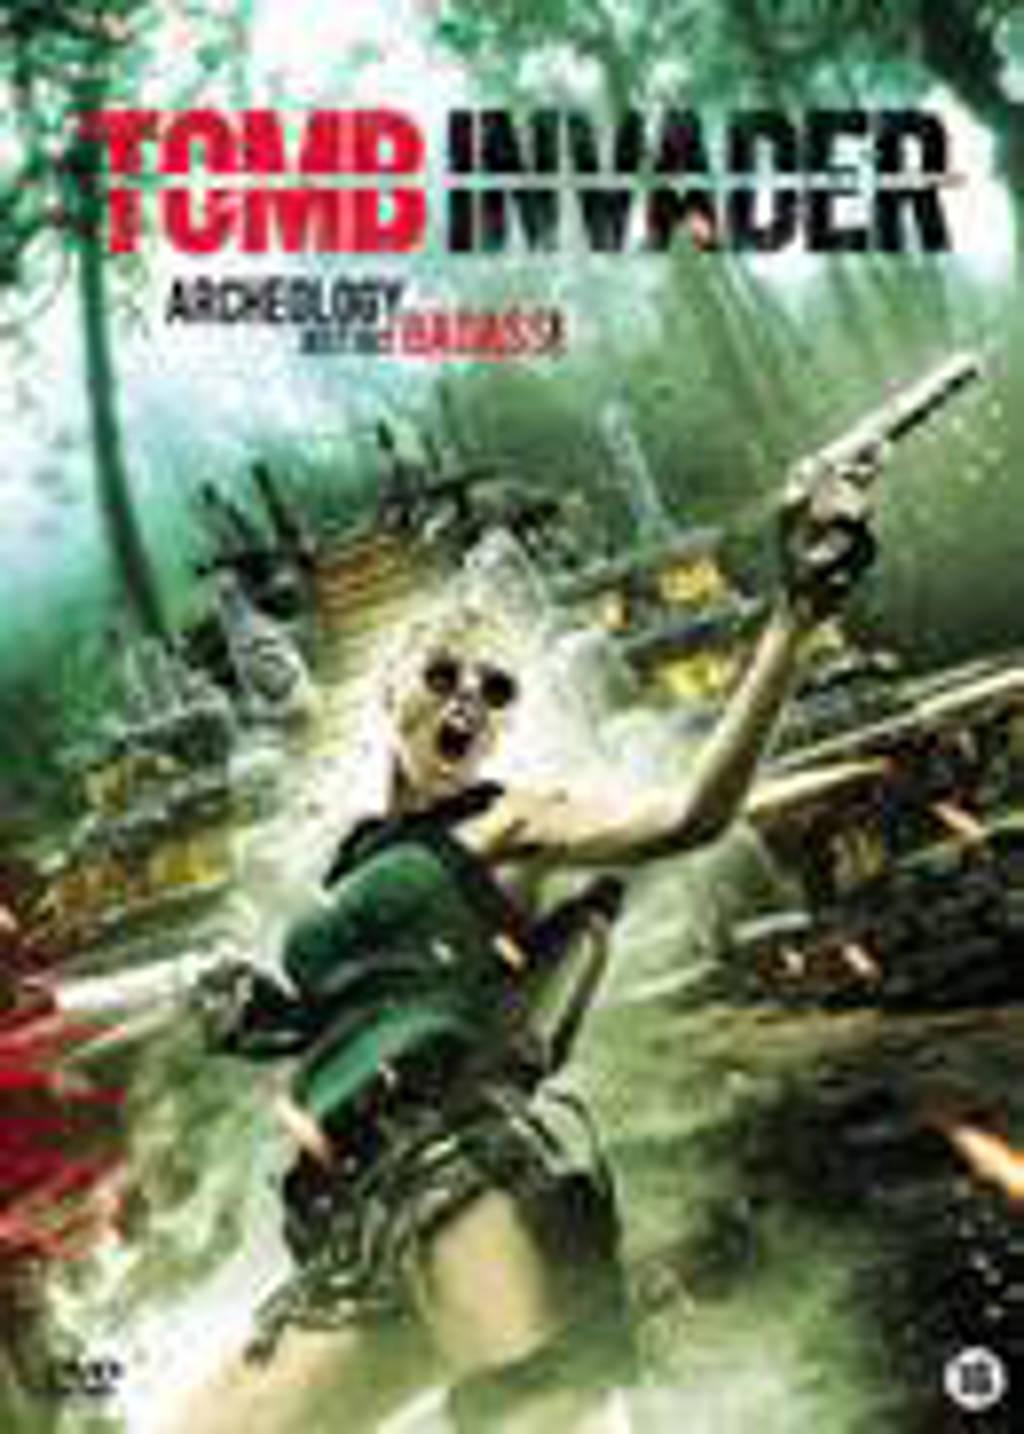 Tomb invader (DVD)